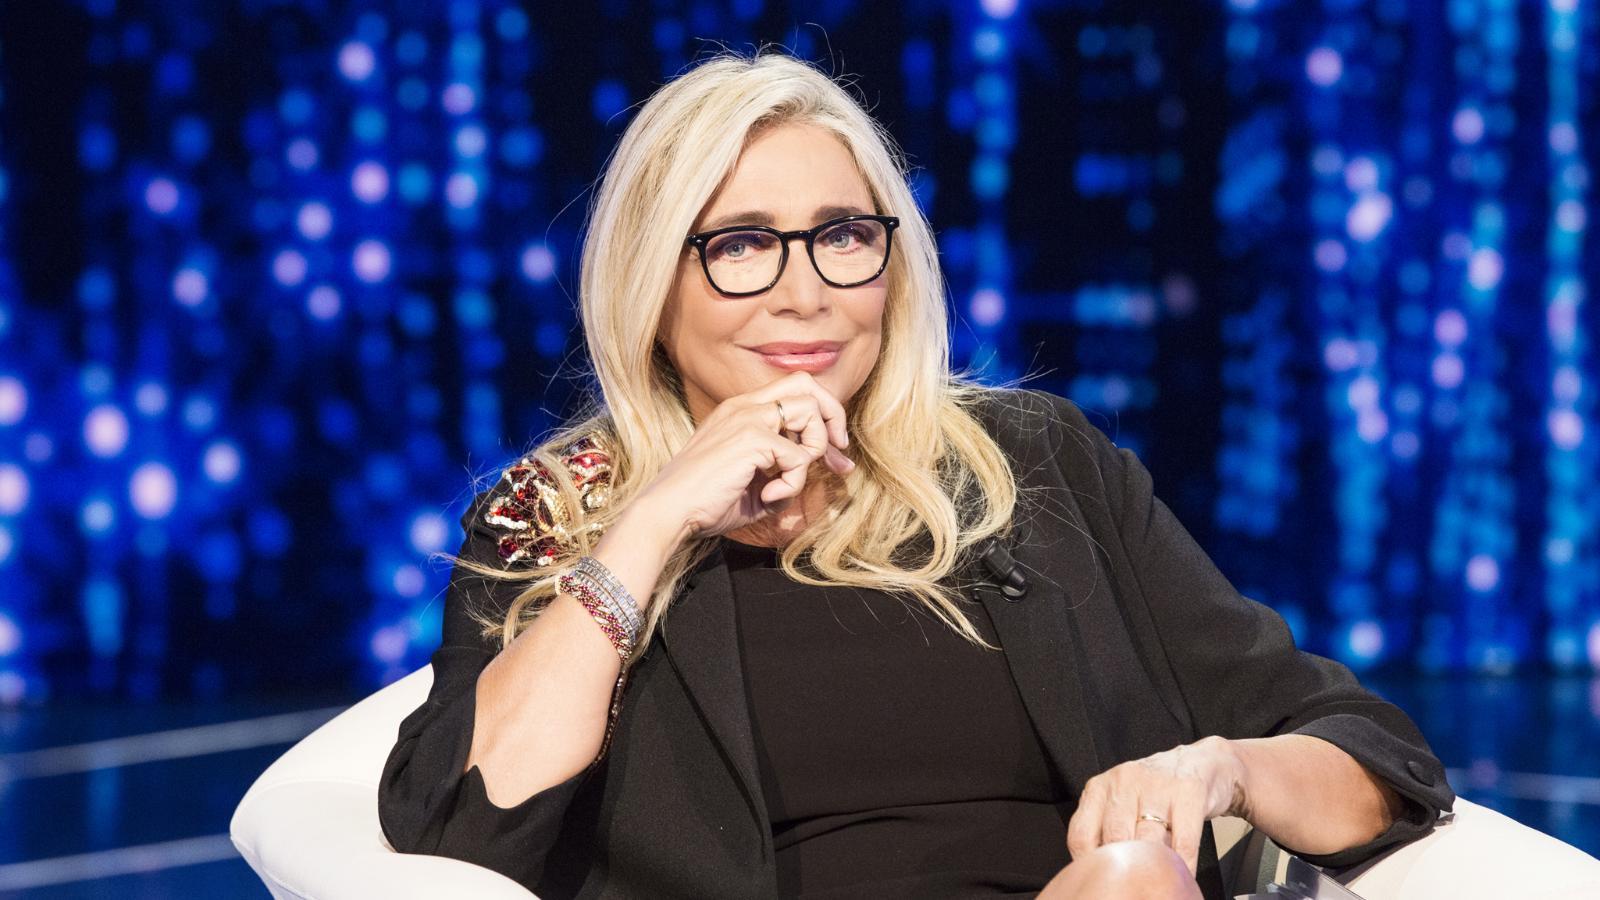 Conduttrice televisiva italiana